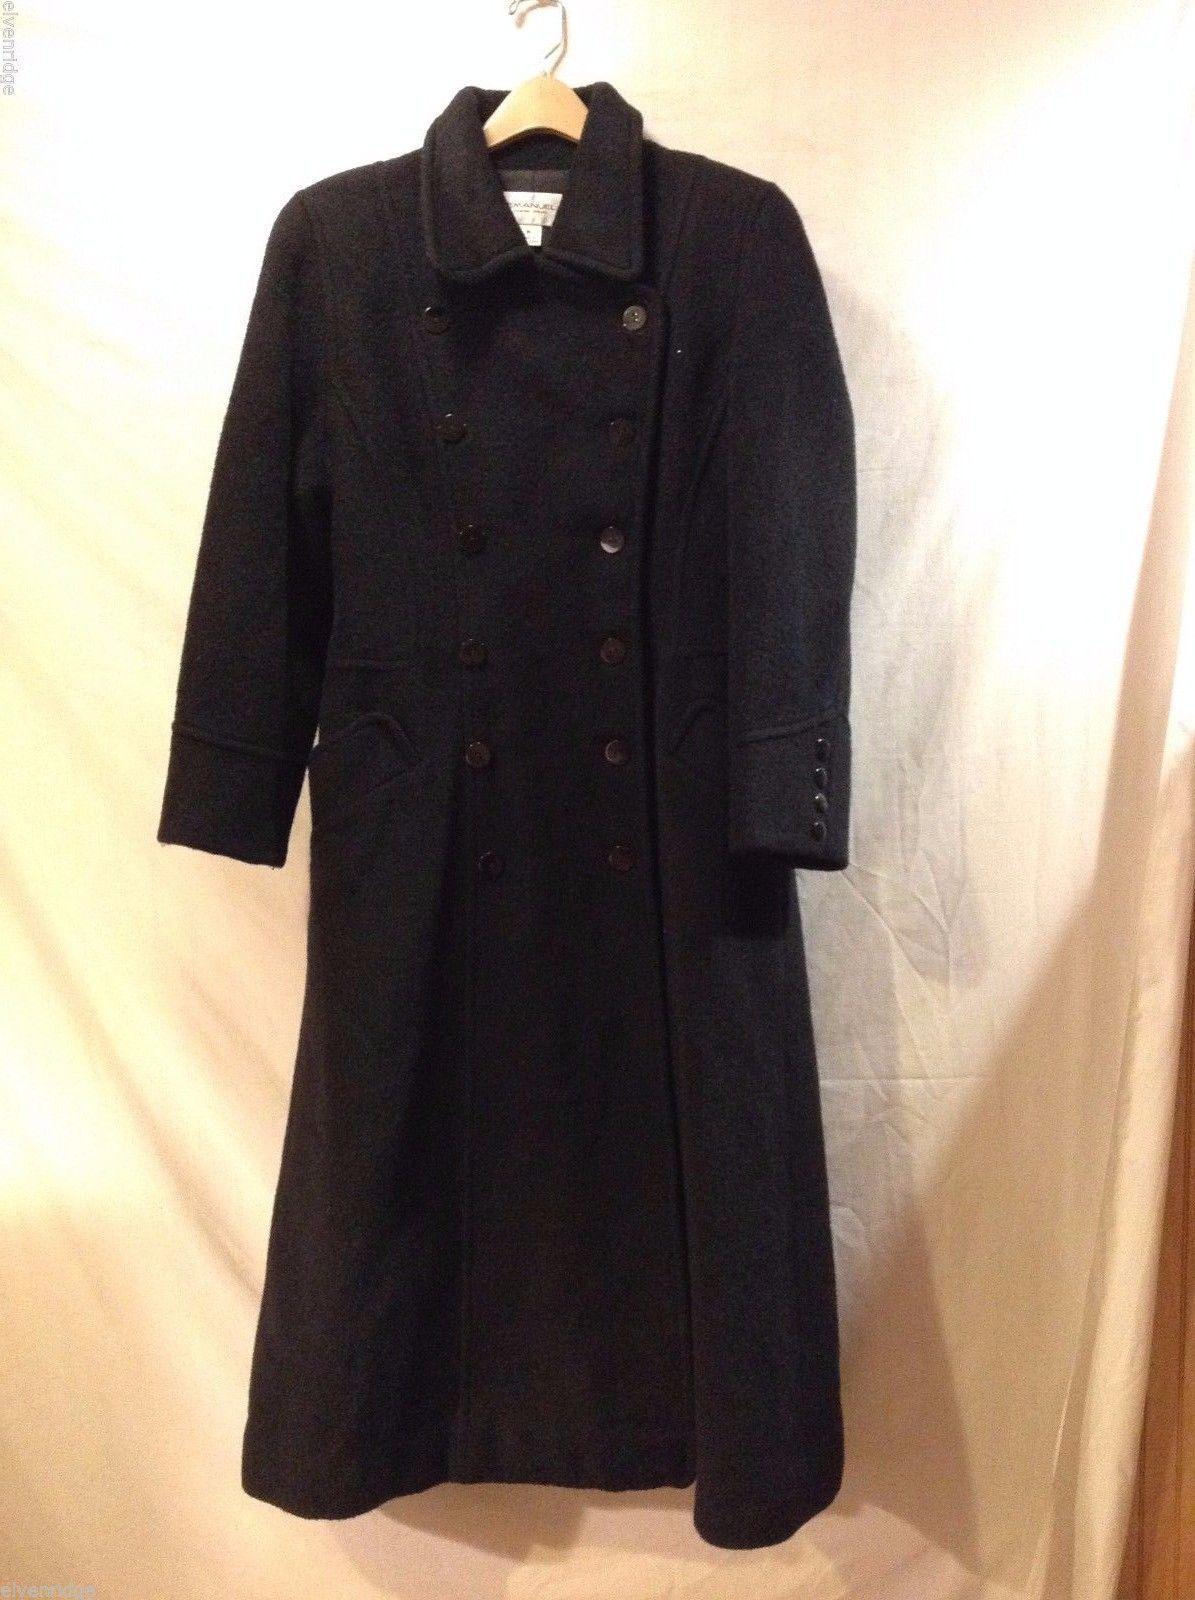 Emanuel Ungaro Wool Alpaca Mohair Blend Winter Full Length Coat